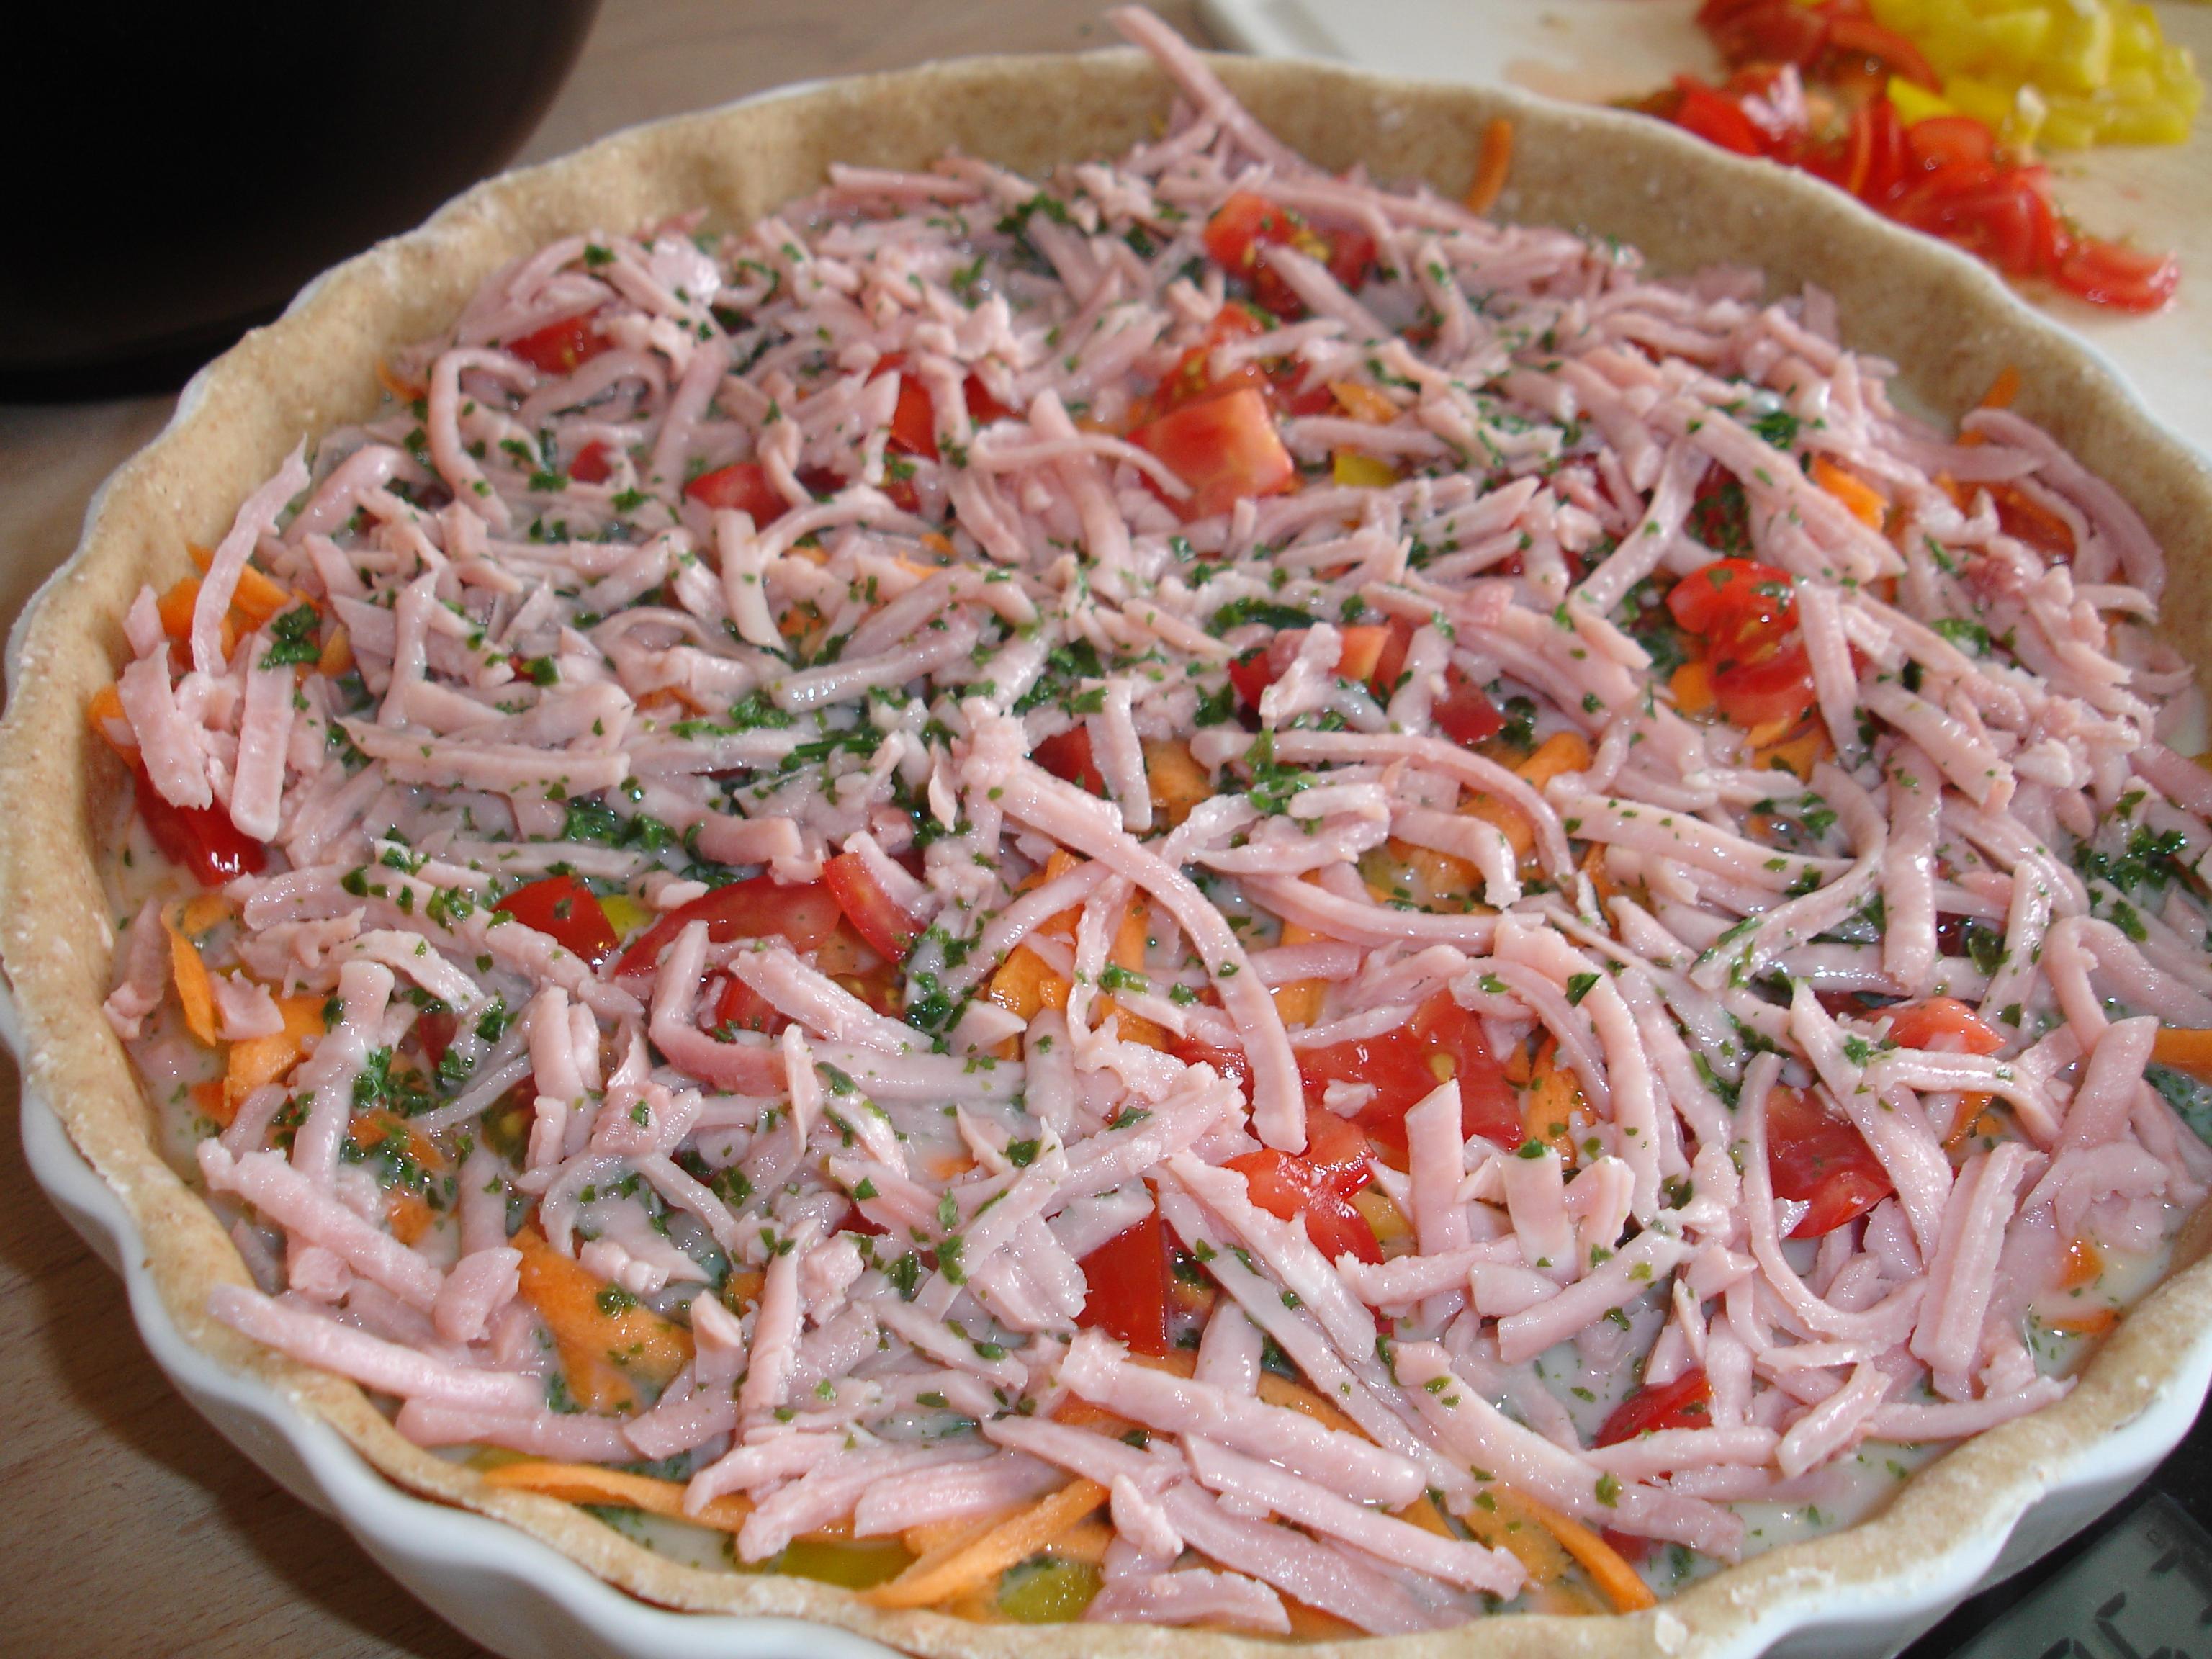 Tærte med skinke, peberfrugt, tomat og gulerod